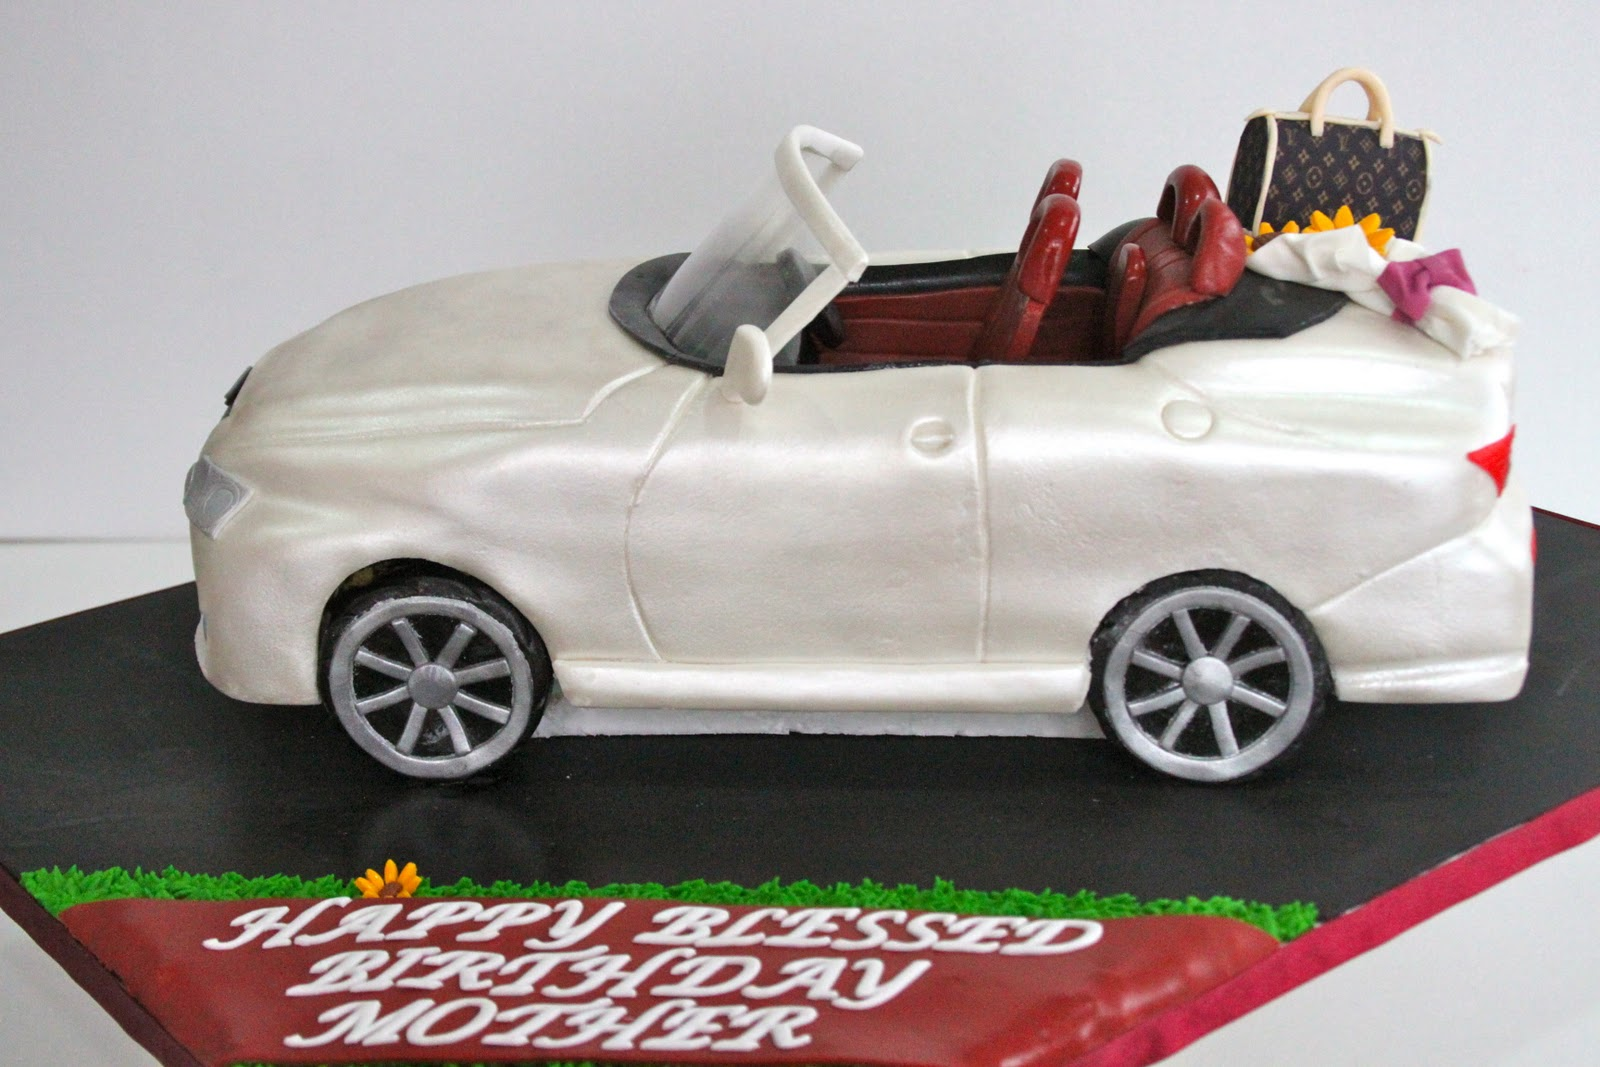 Lexus Themed Birthday Cake Images